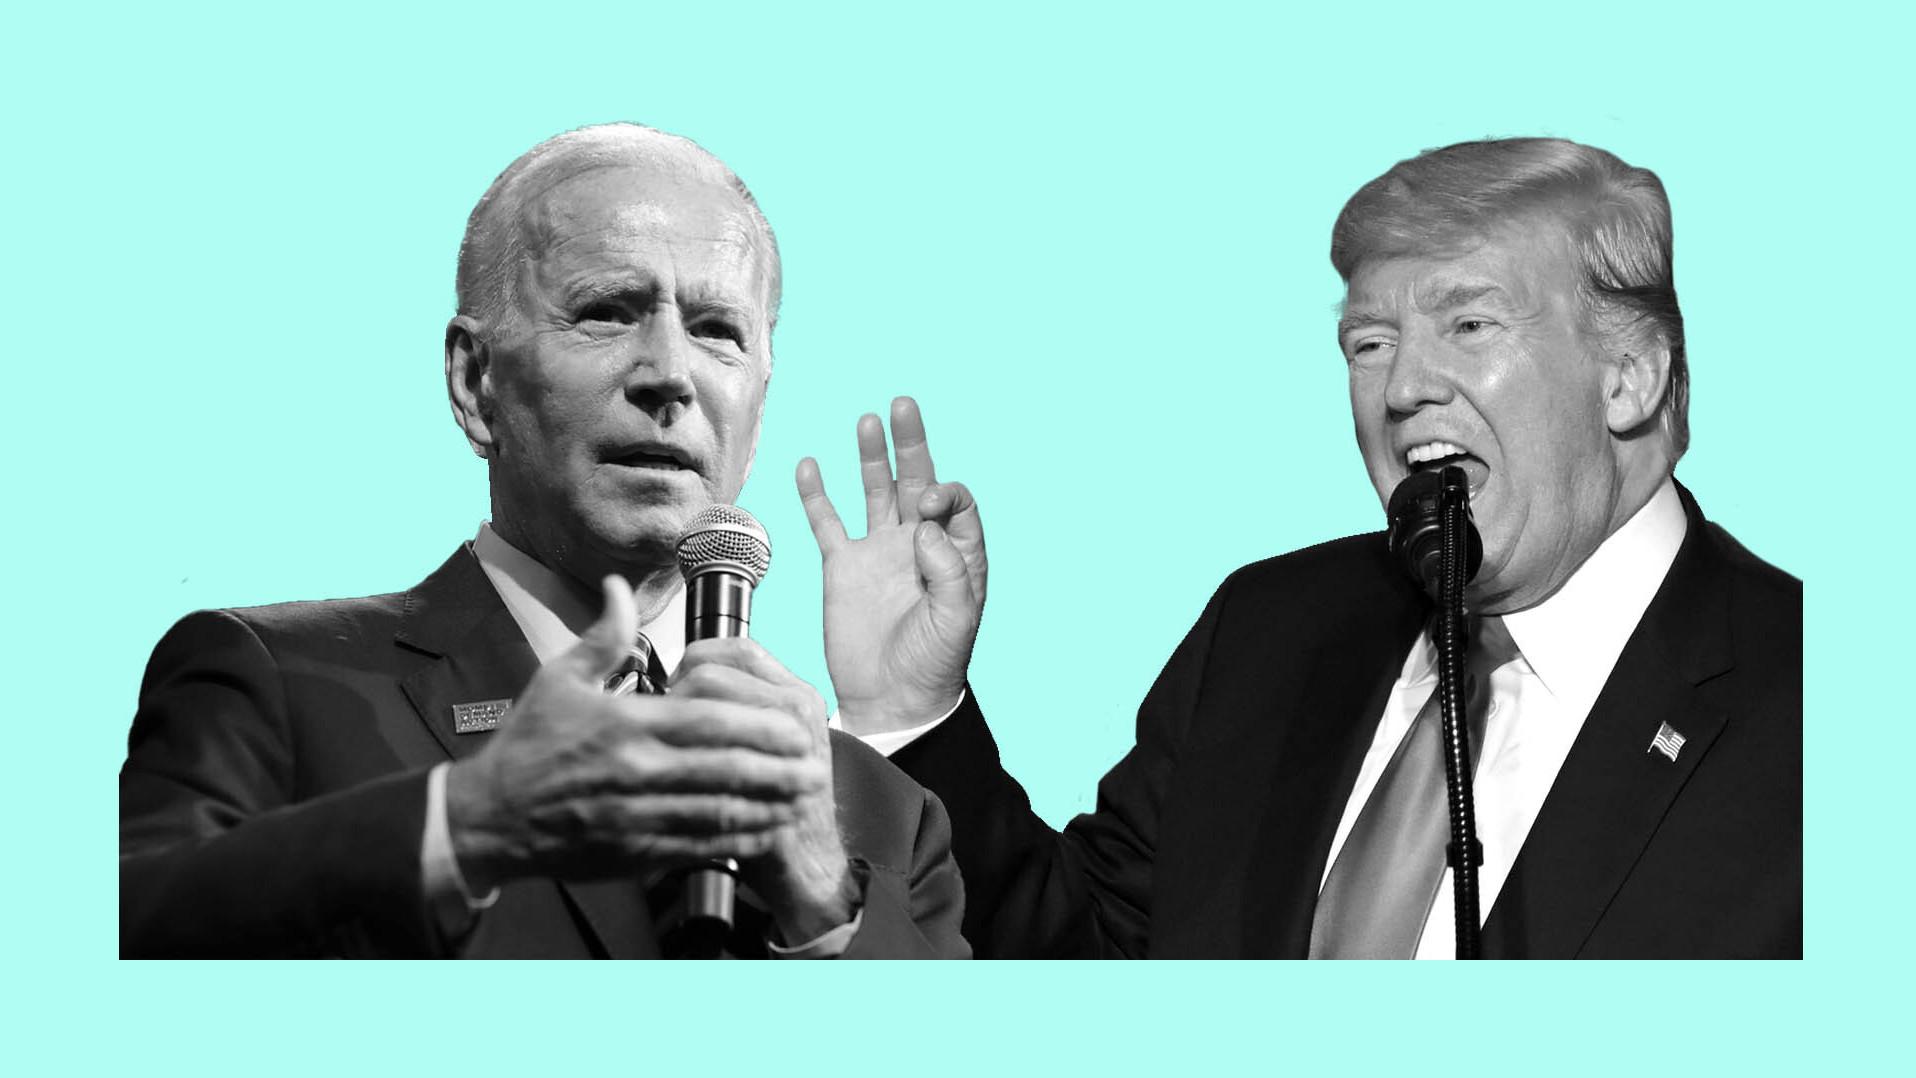 Democratic presidential nominee Joe Biden and President Trump will have their final debate on Thursday.